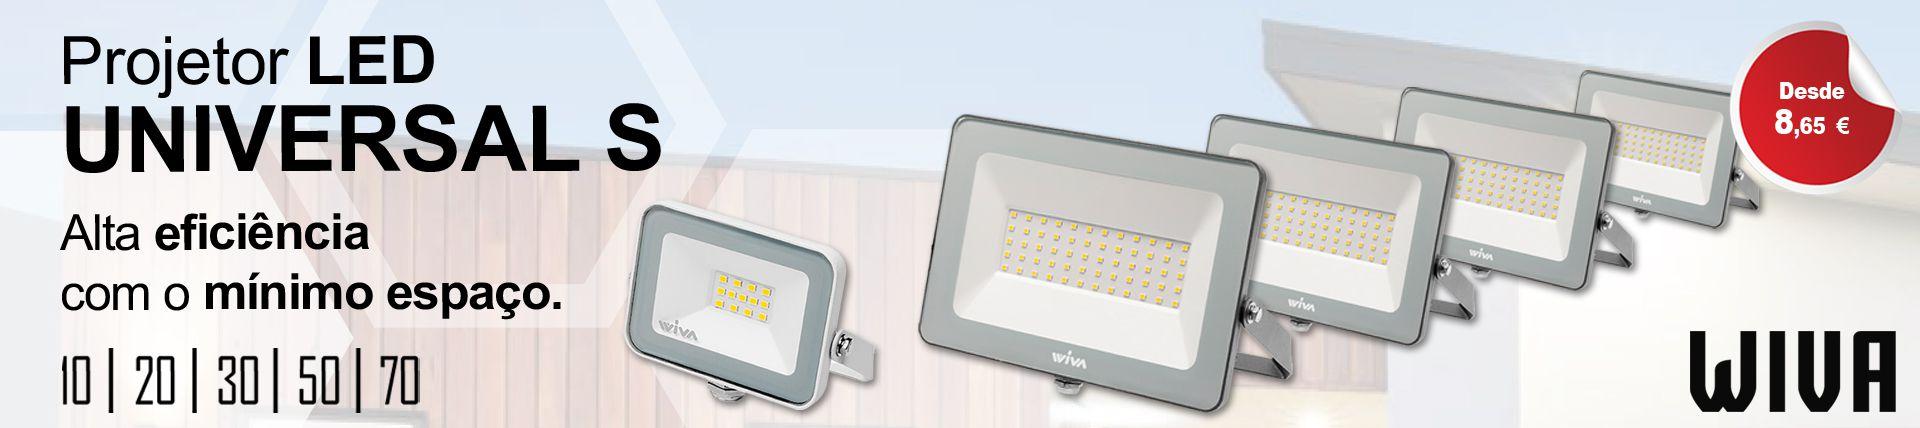 projetores-led